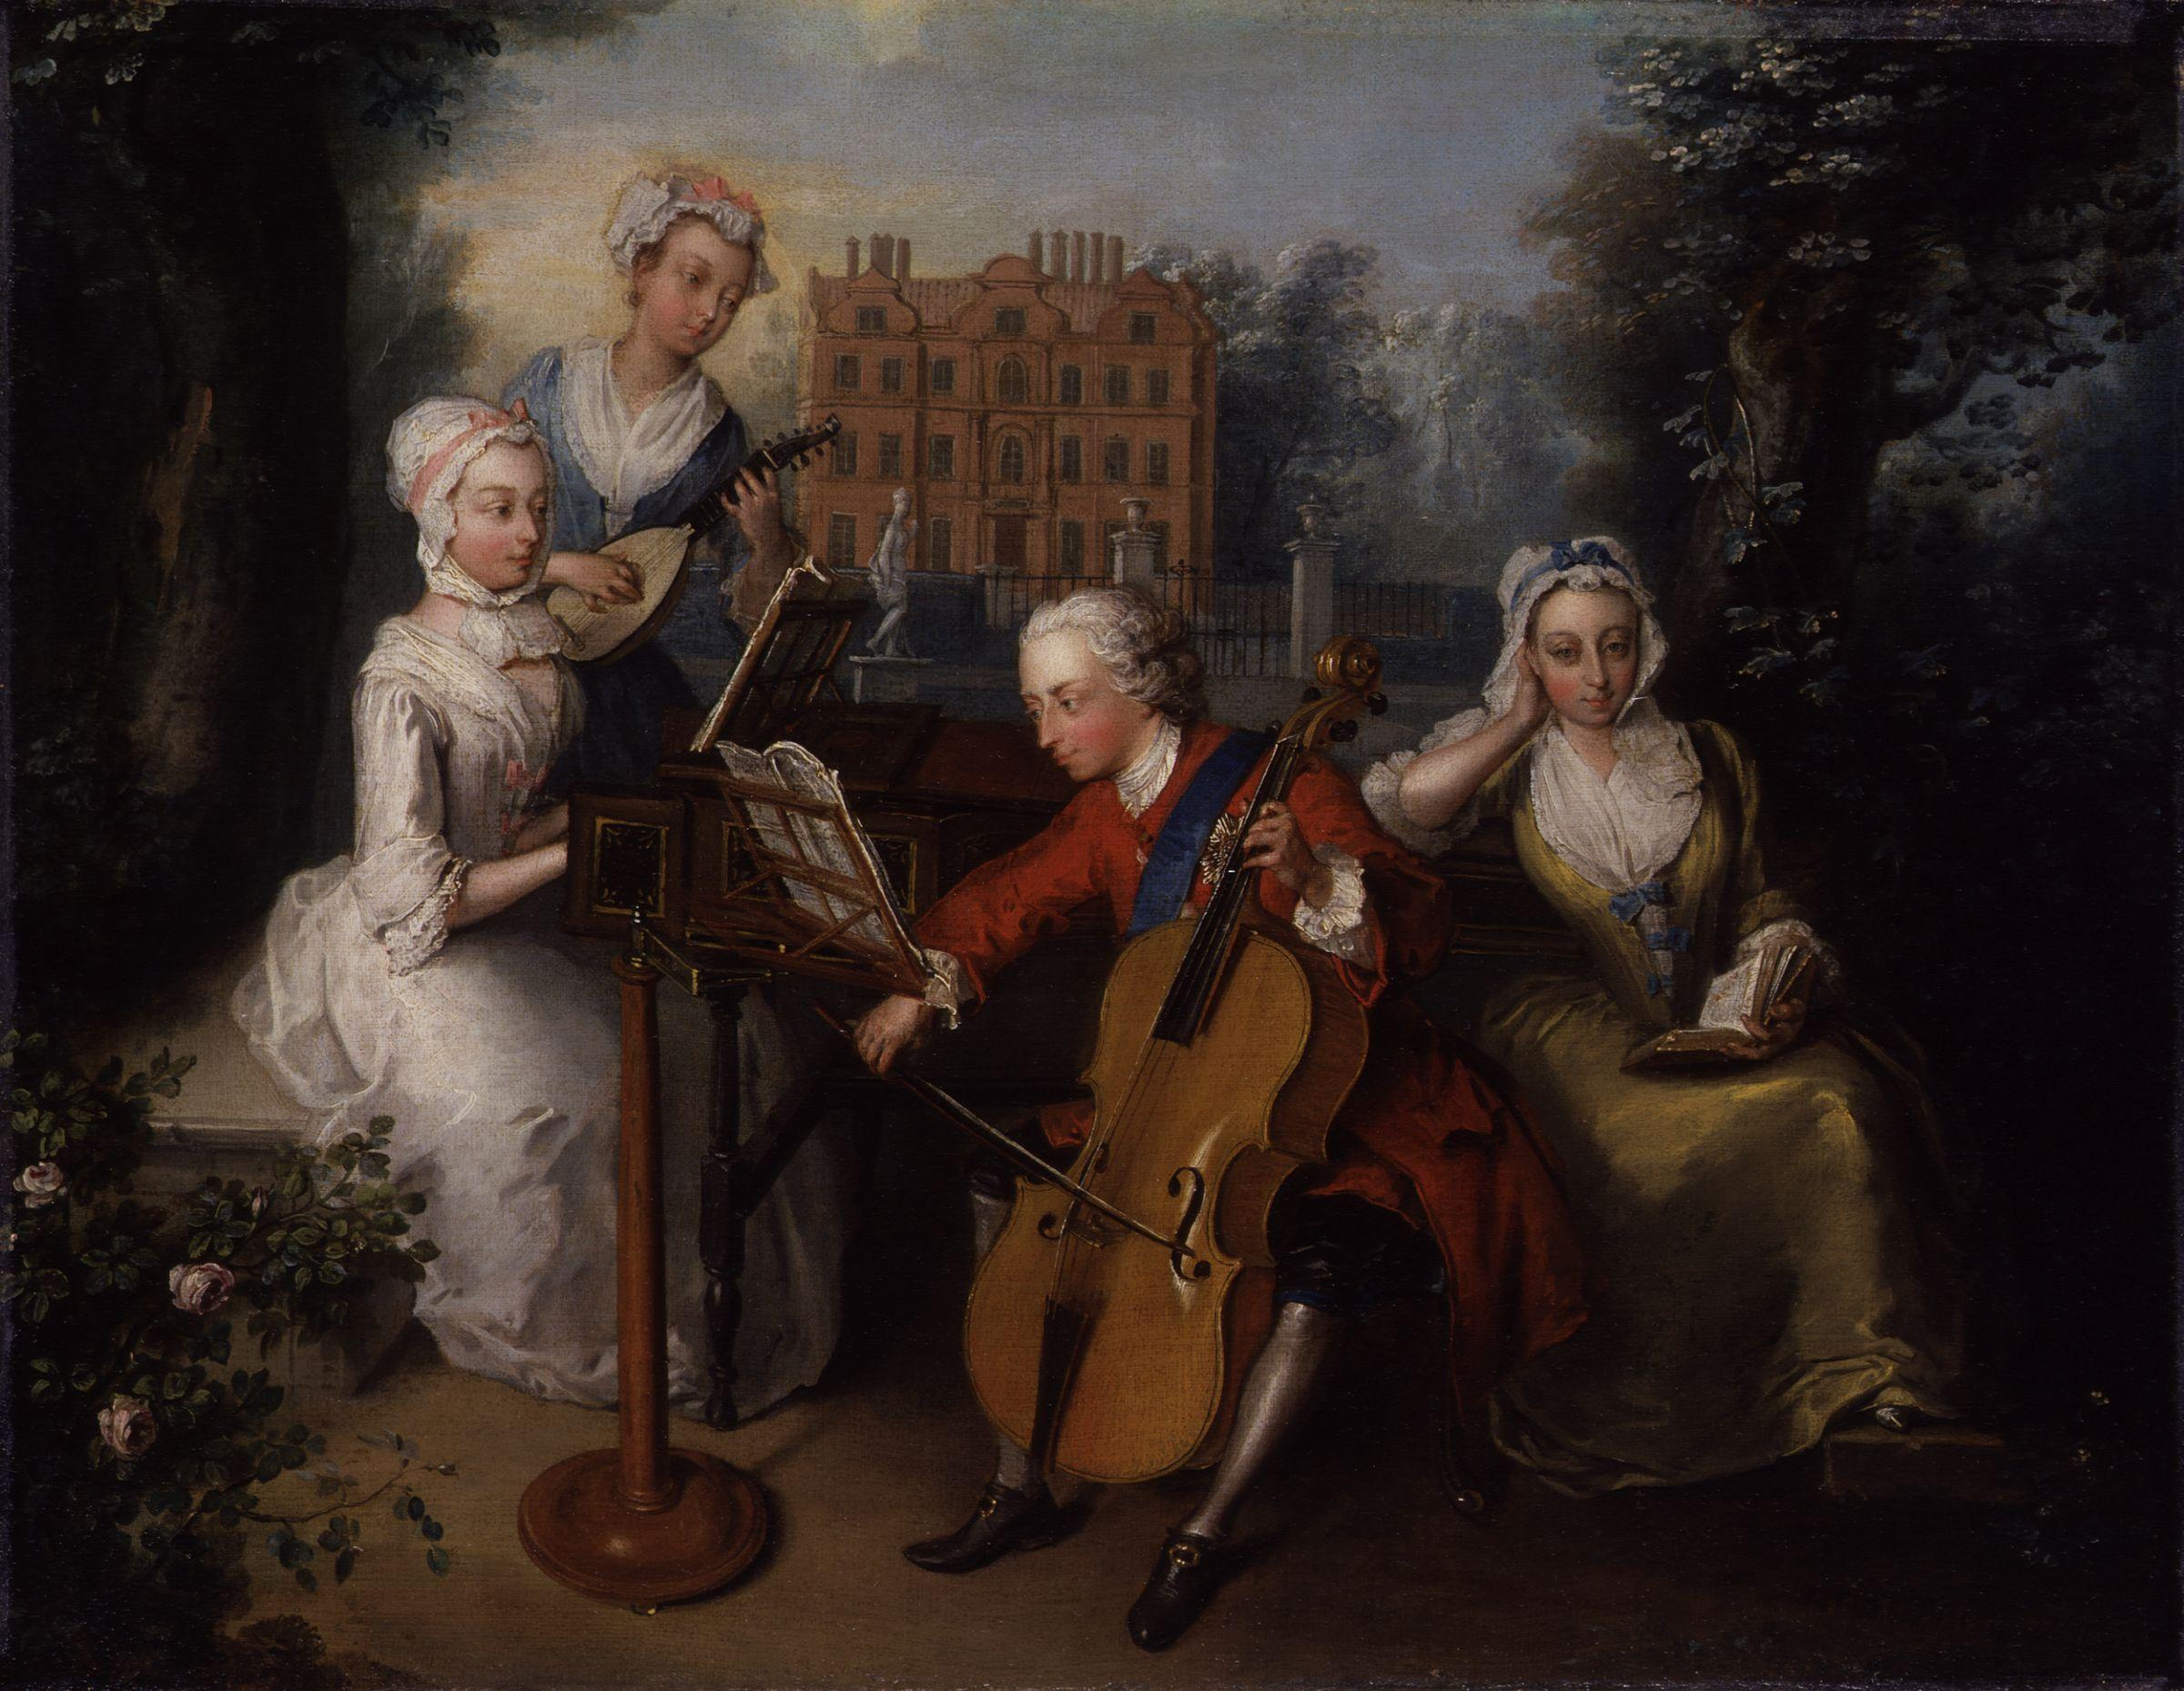 Musica Sacra Barocca N.A.Porpora Magnificat